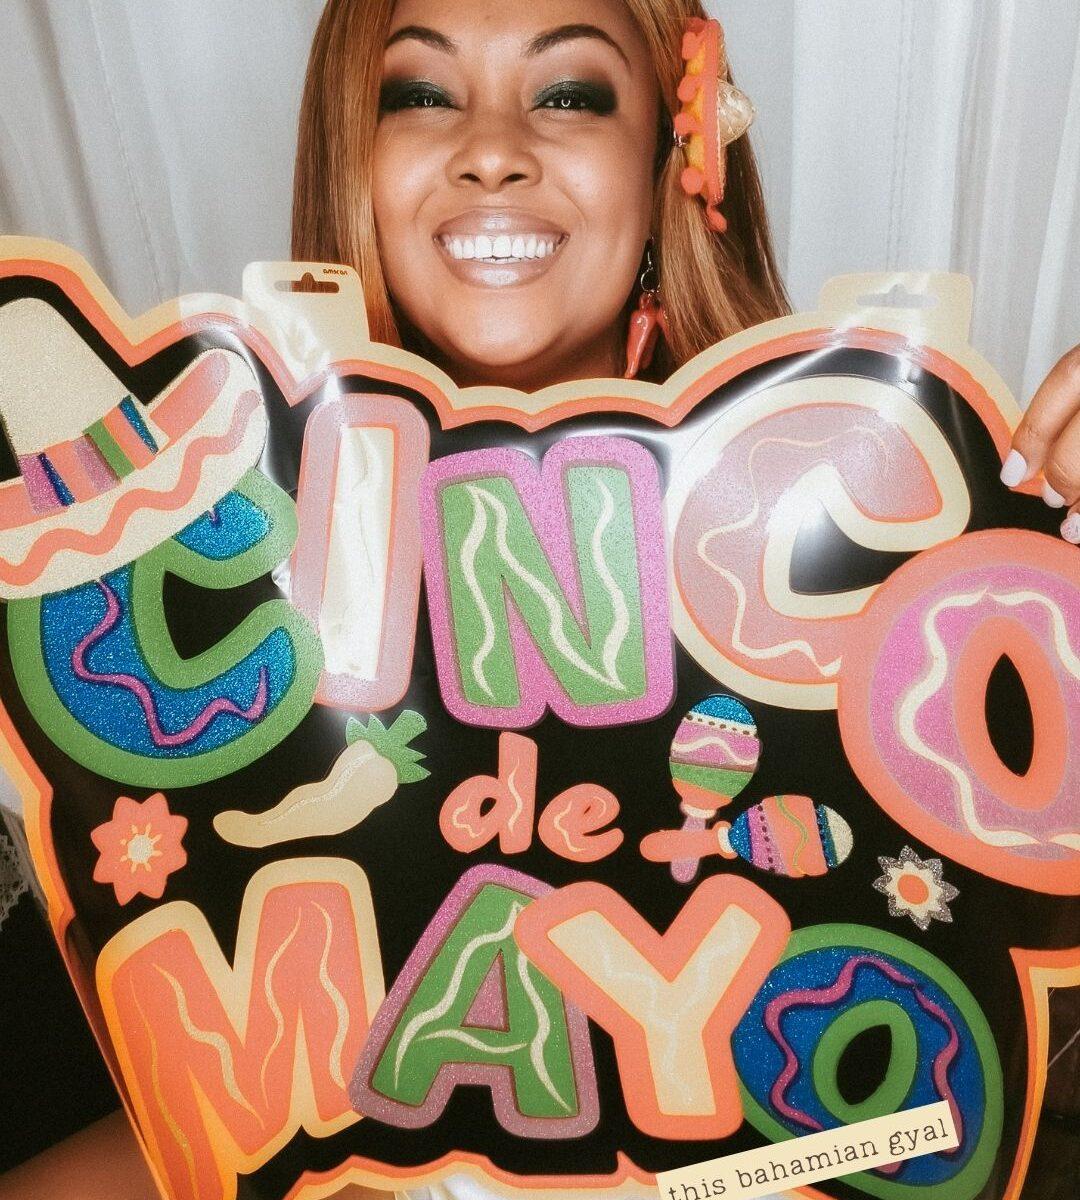 This Bahamian Gyal blogger, Rogan Smith poses with a Cinco de Mayo sign